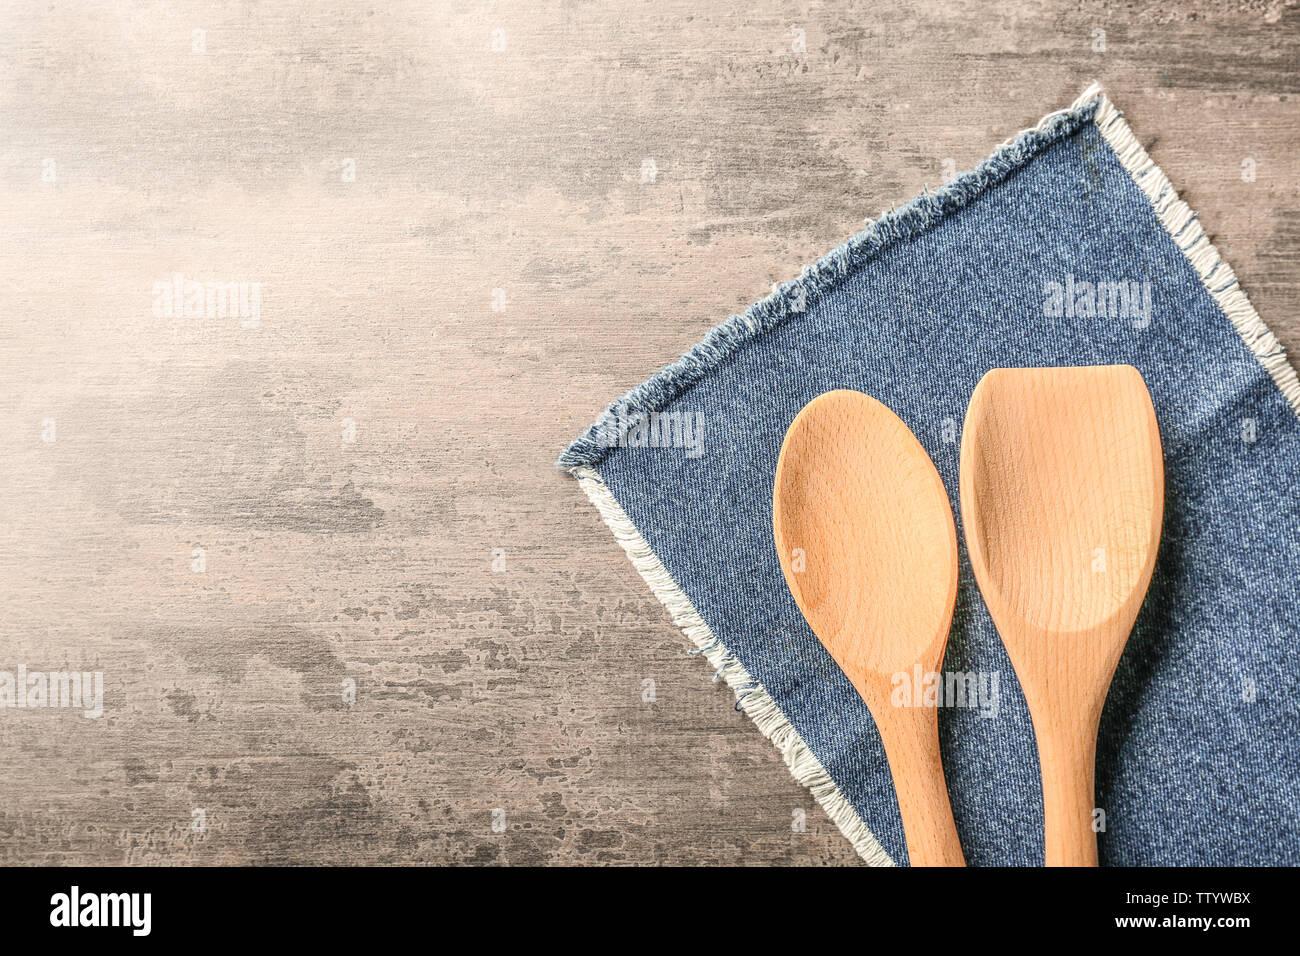 Wooden kitchen utensils with denim napkin on table - Stock Image